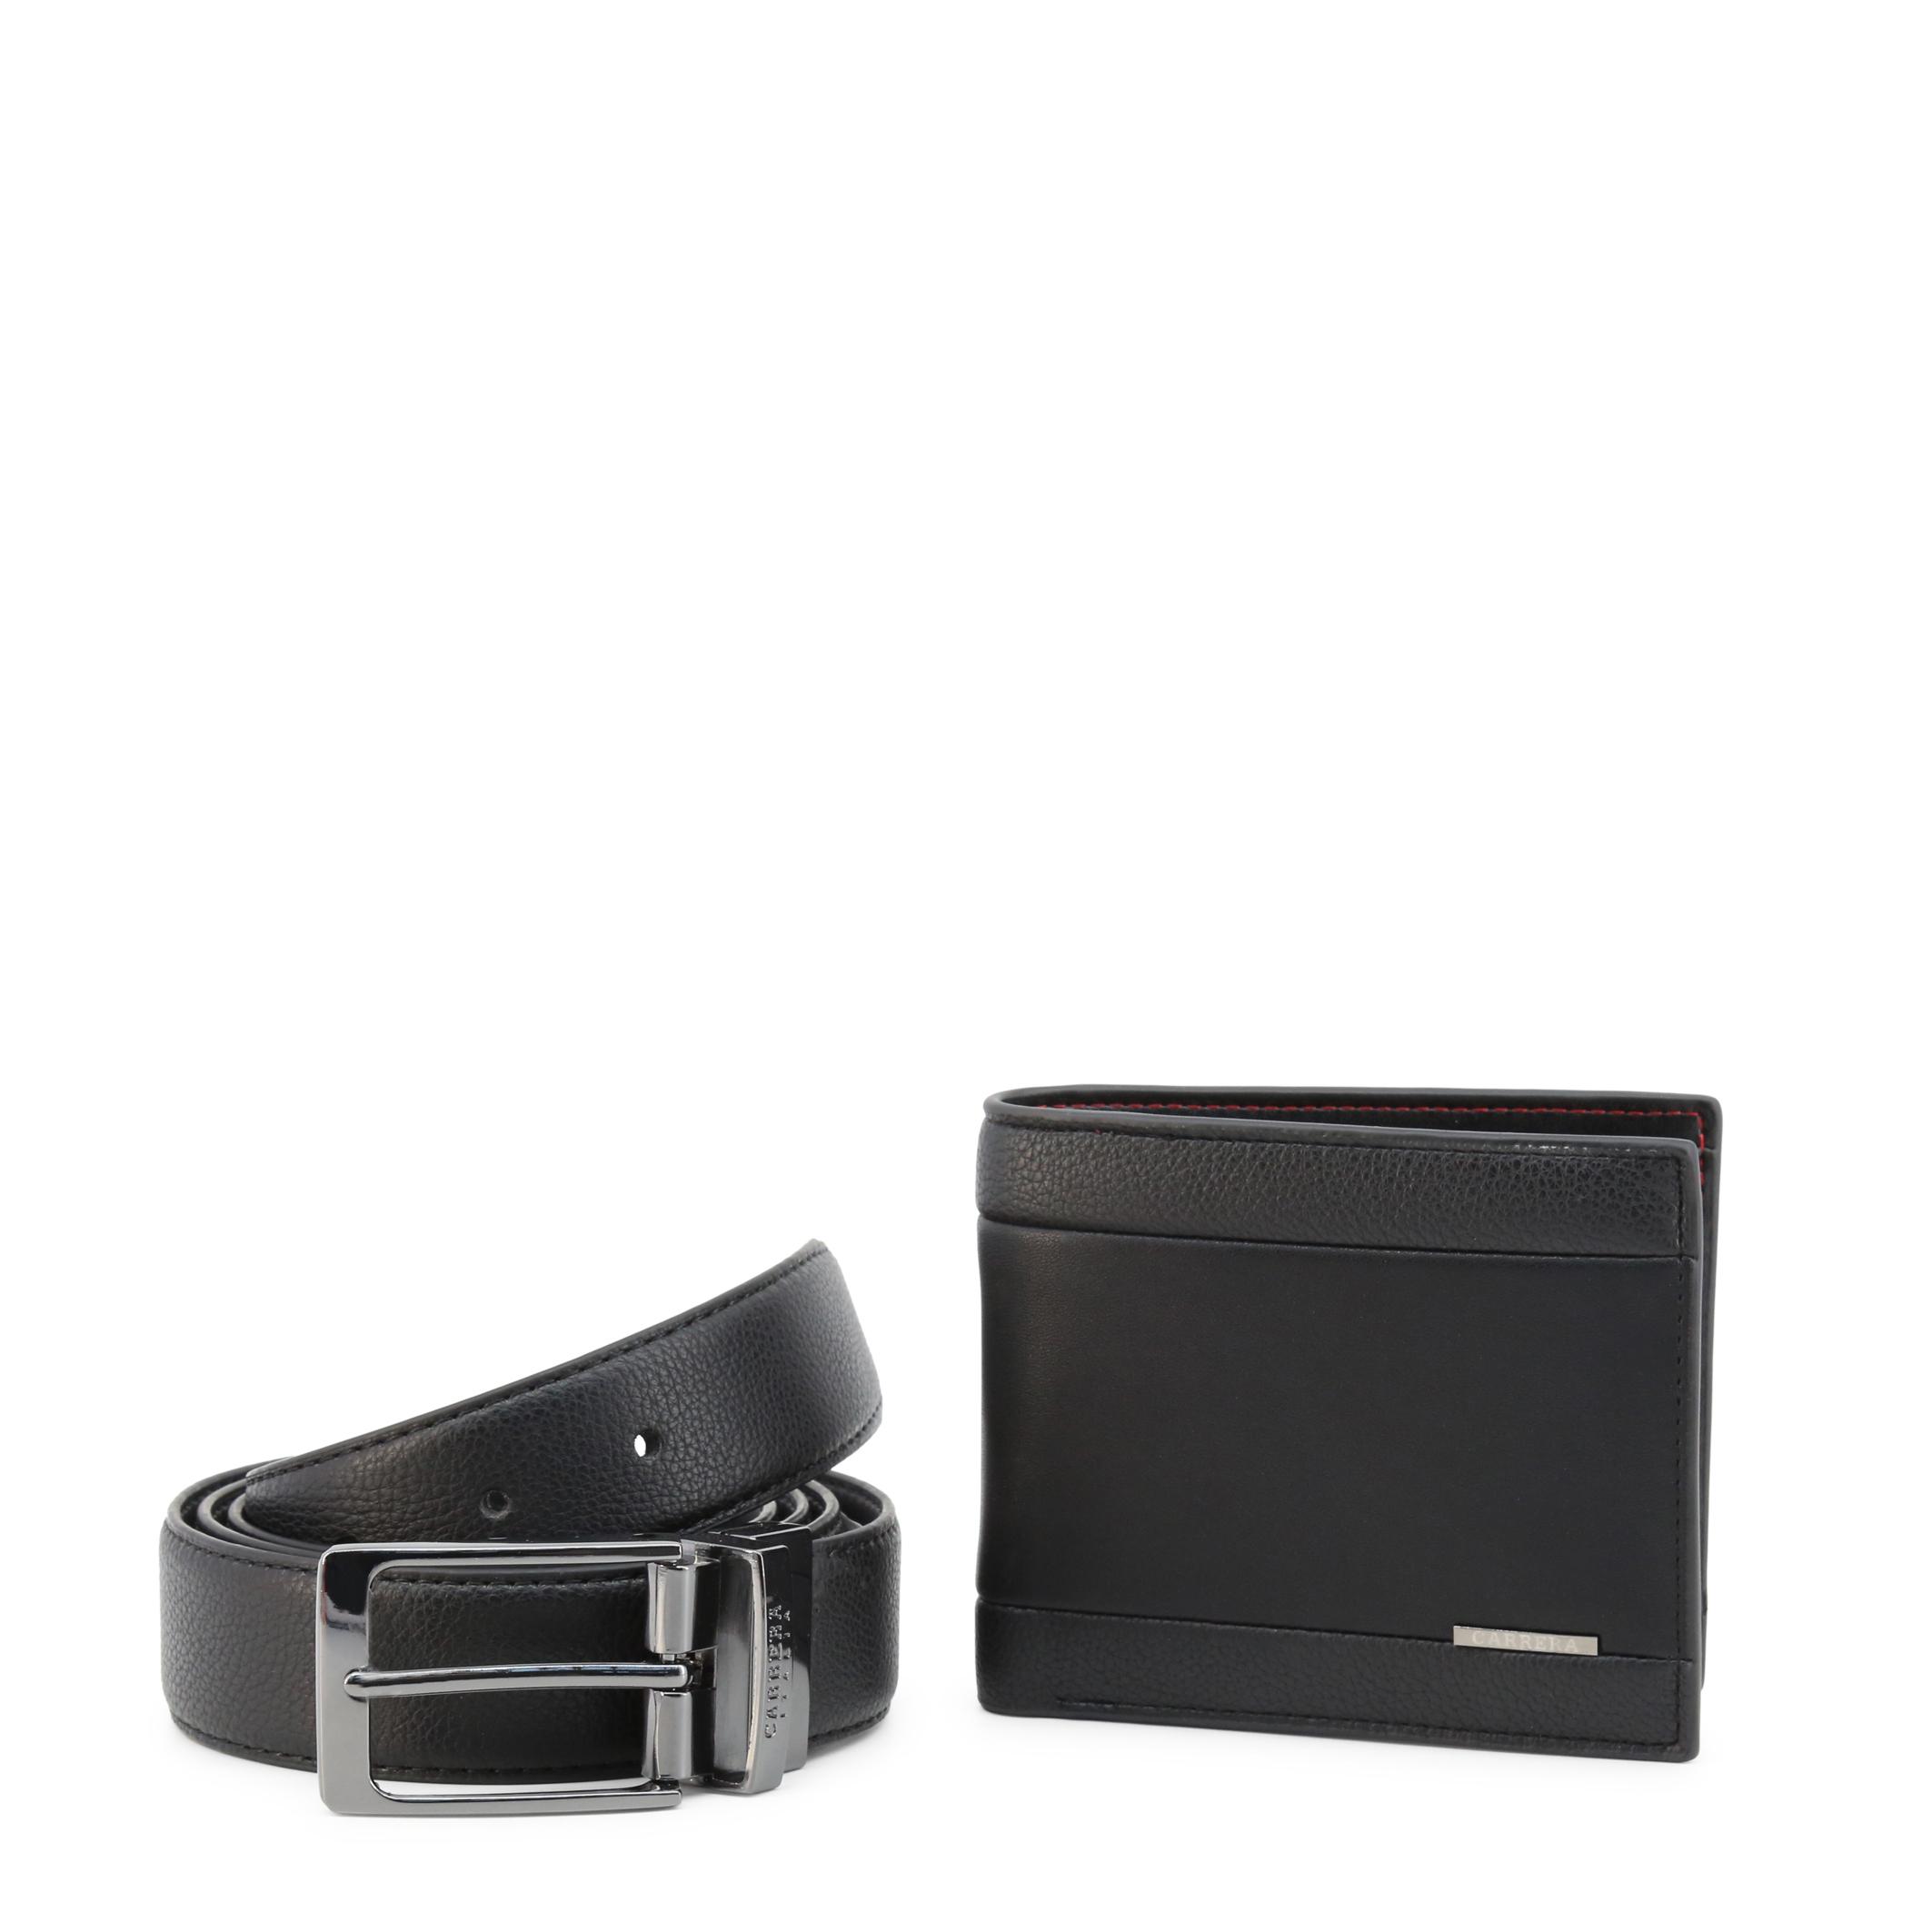 Box Carrera Jeans – ALAN_CB3607C